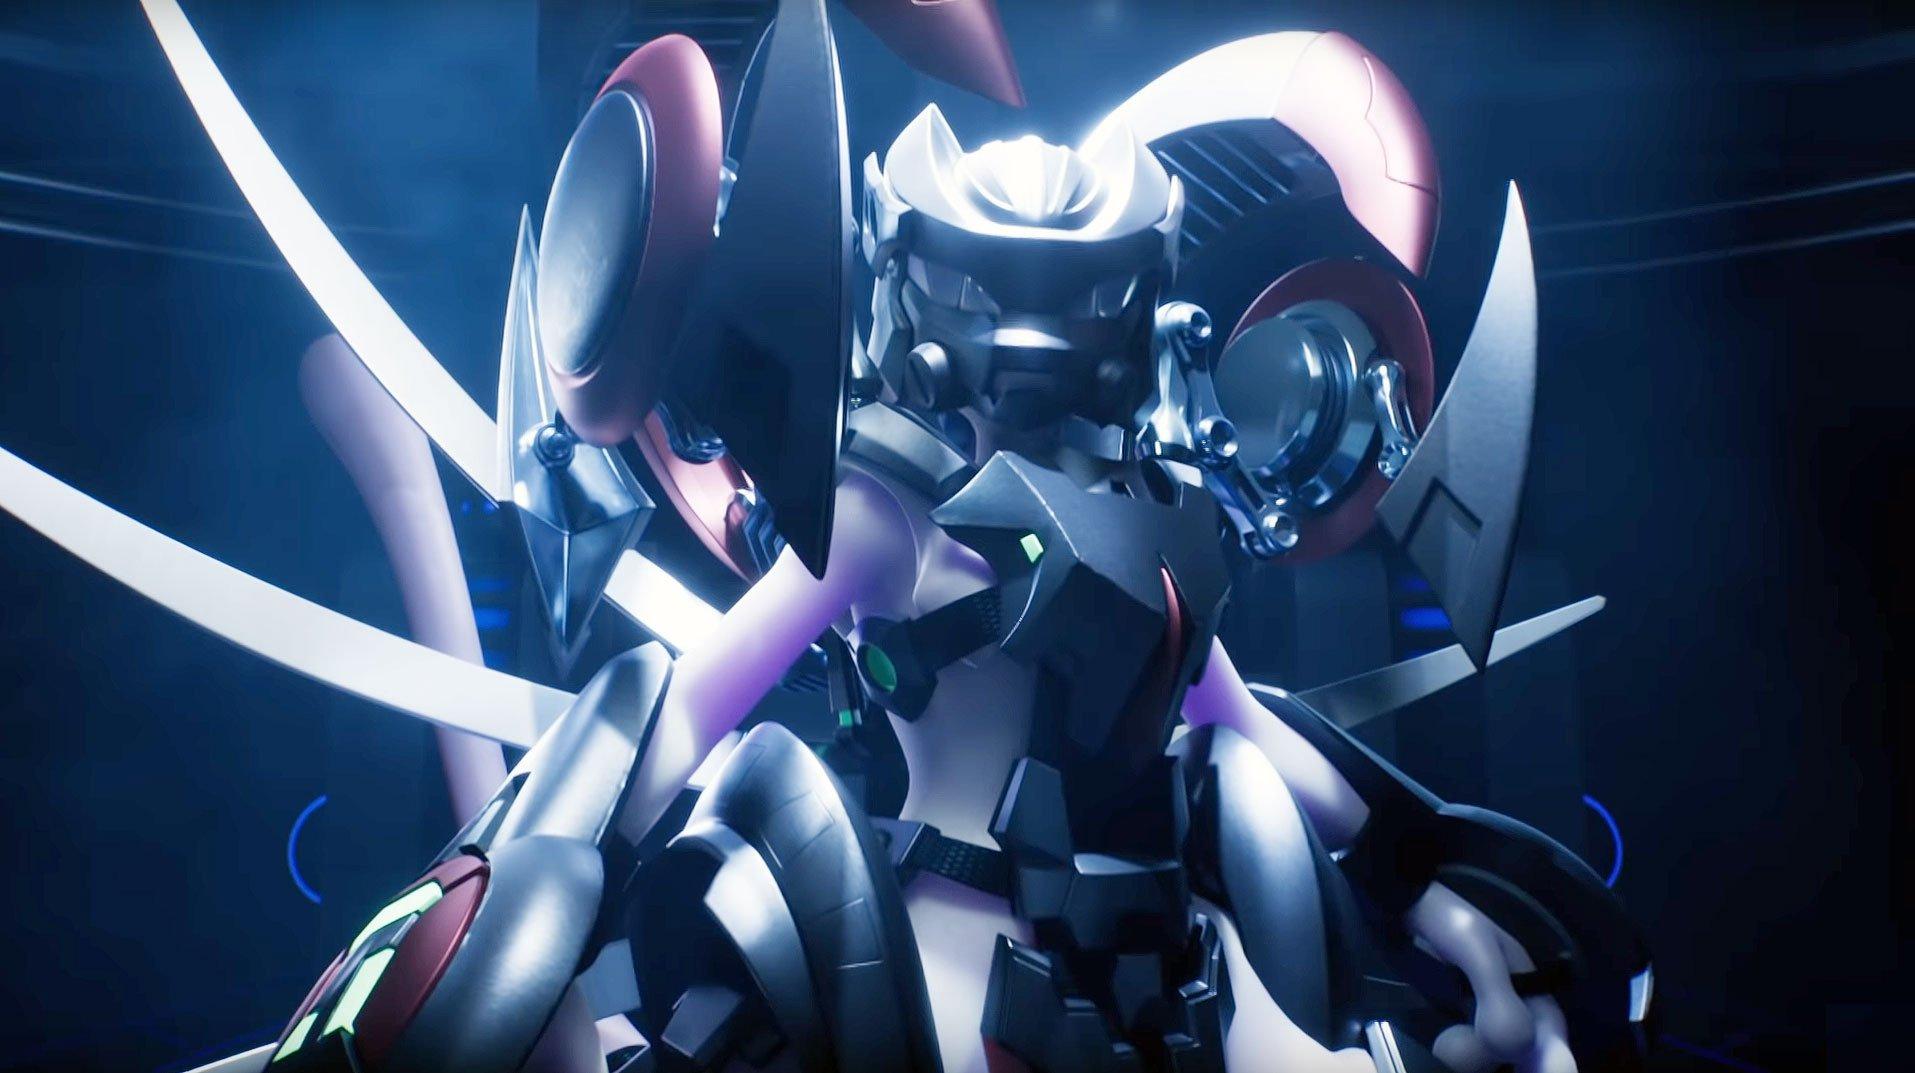 Armored Mewtwo Redesign Revealed In The New Mewtwo Strikes Back Evolution Trailer Pokemon Go Hub